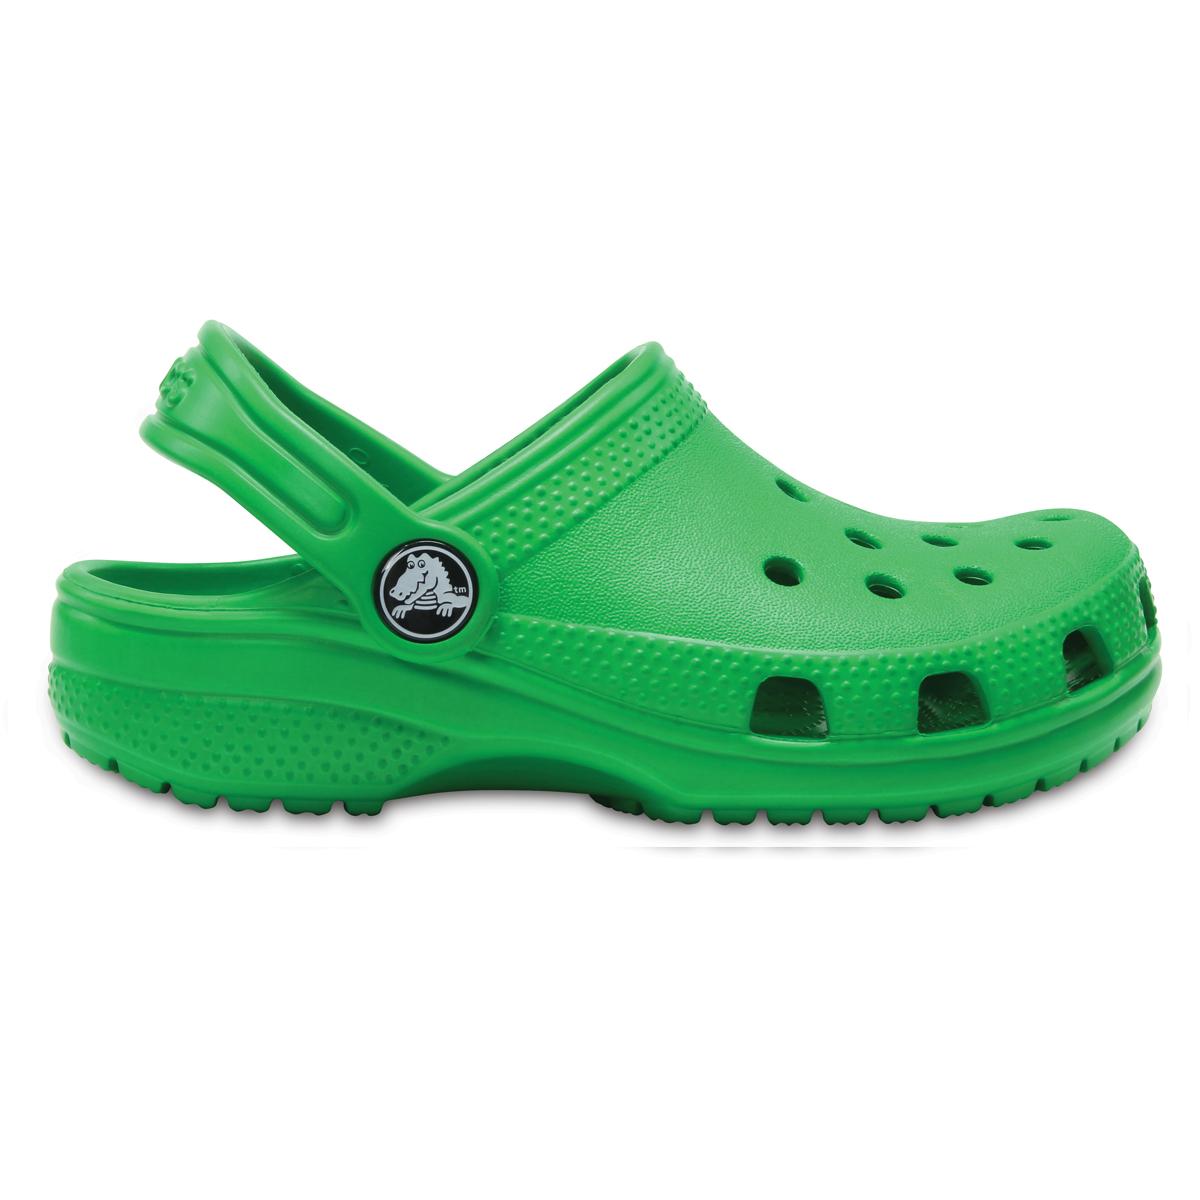 Crocs Classic Clog K - Çim yeşili